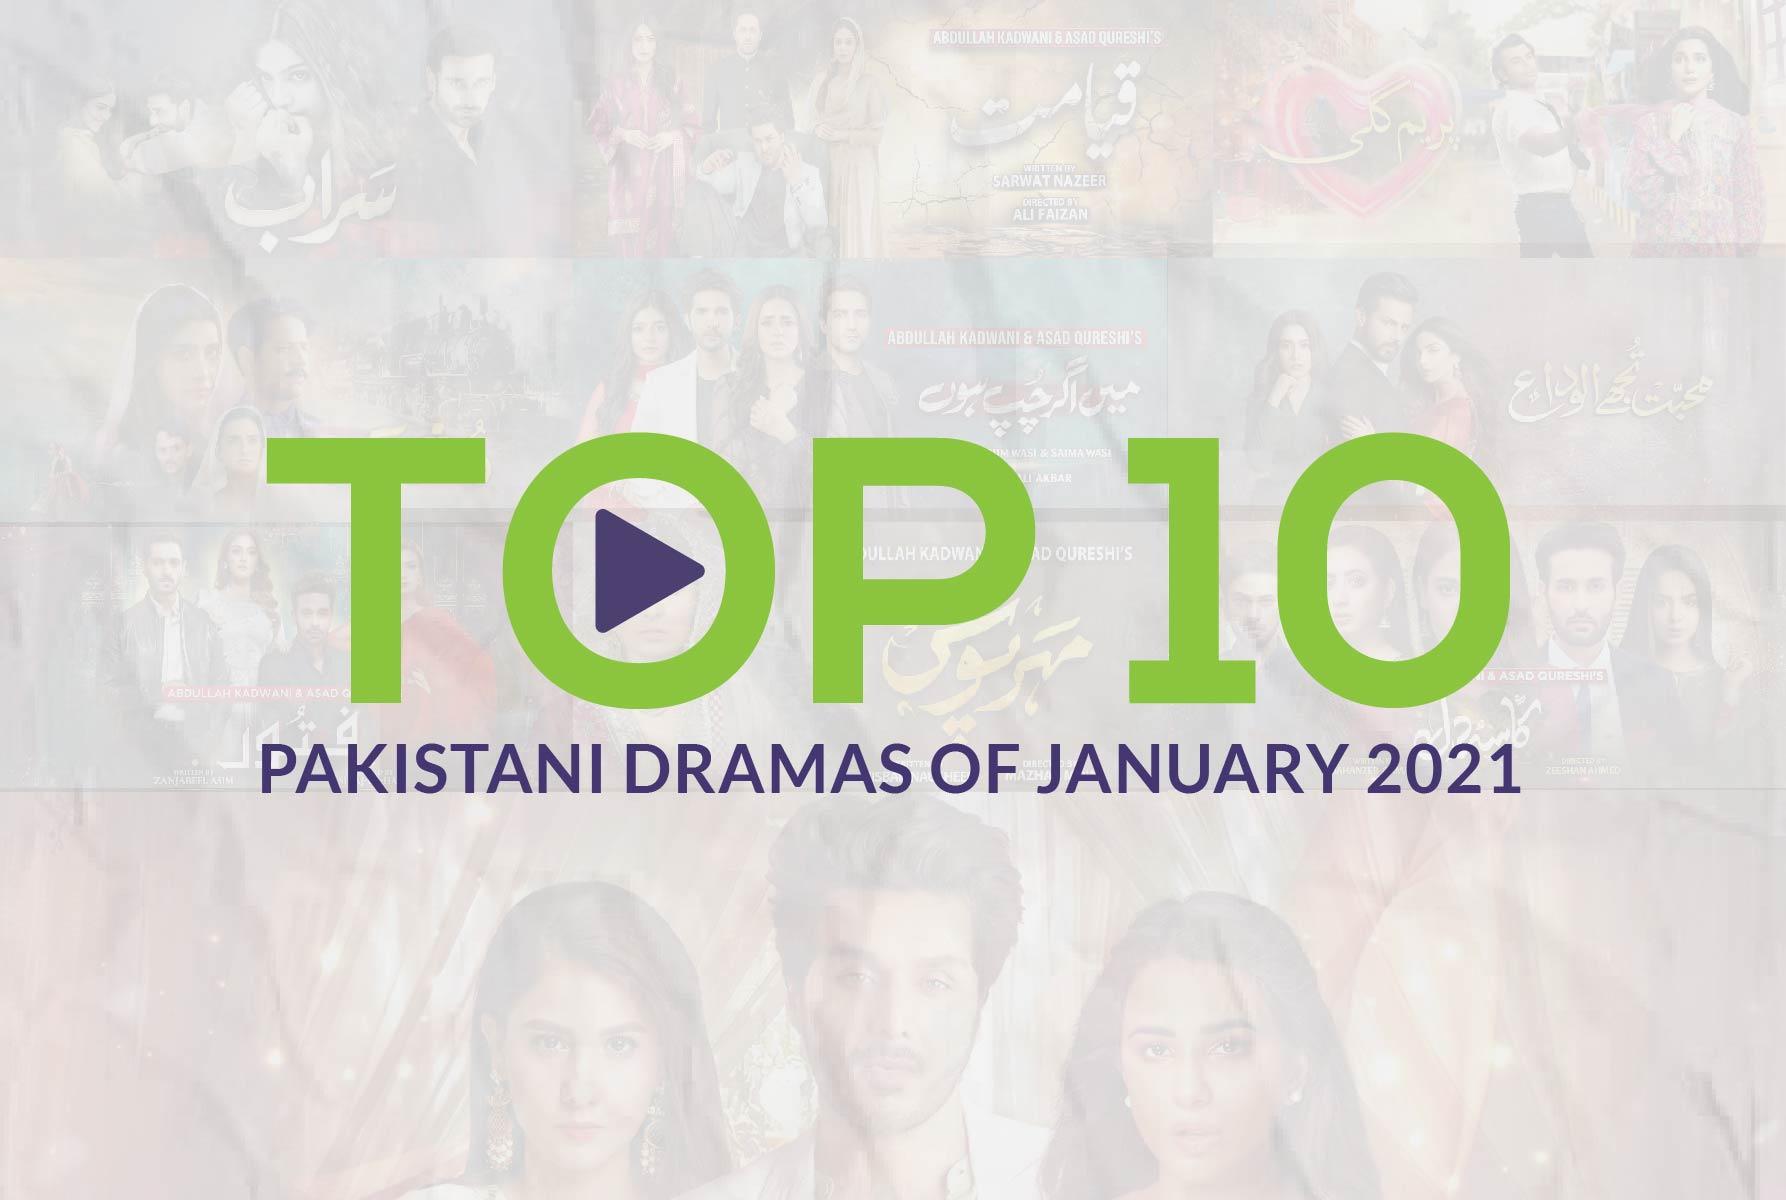 Top_10_Pakistani_Drama_Of_January_Fashion_Collection_2021